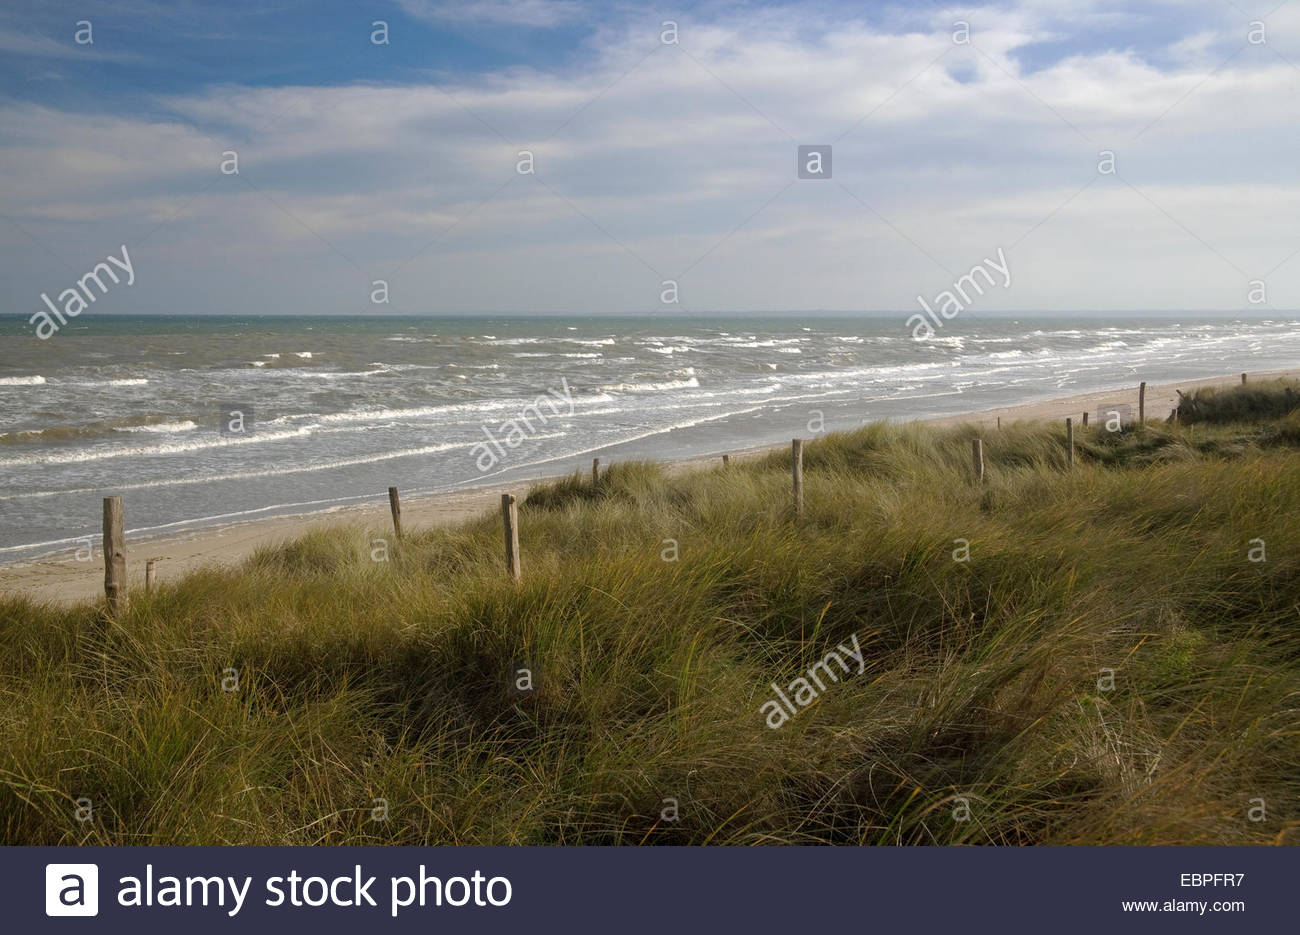 Utah Beach, site of American landing on June 6, 1944, Normandy, France Stock Photo